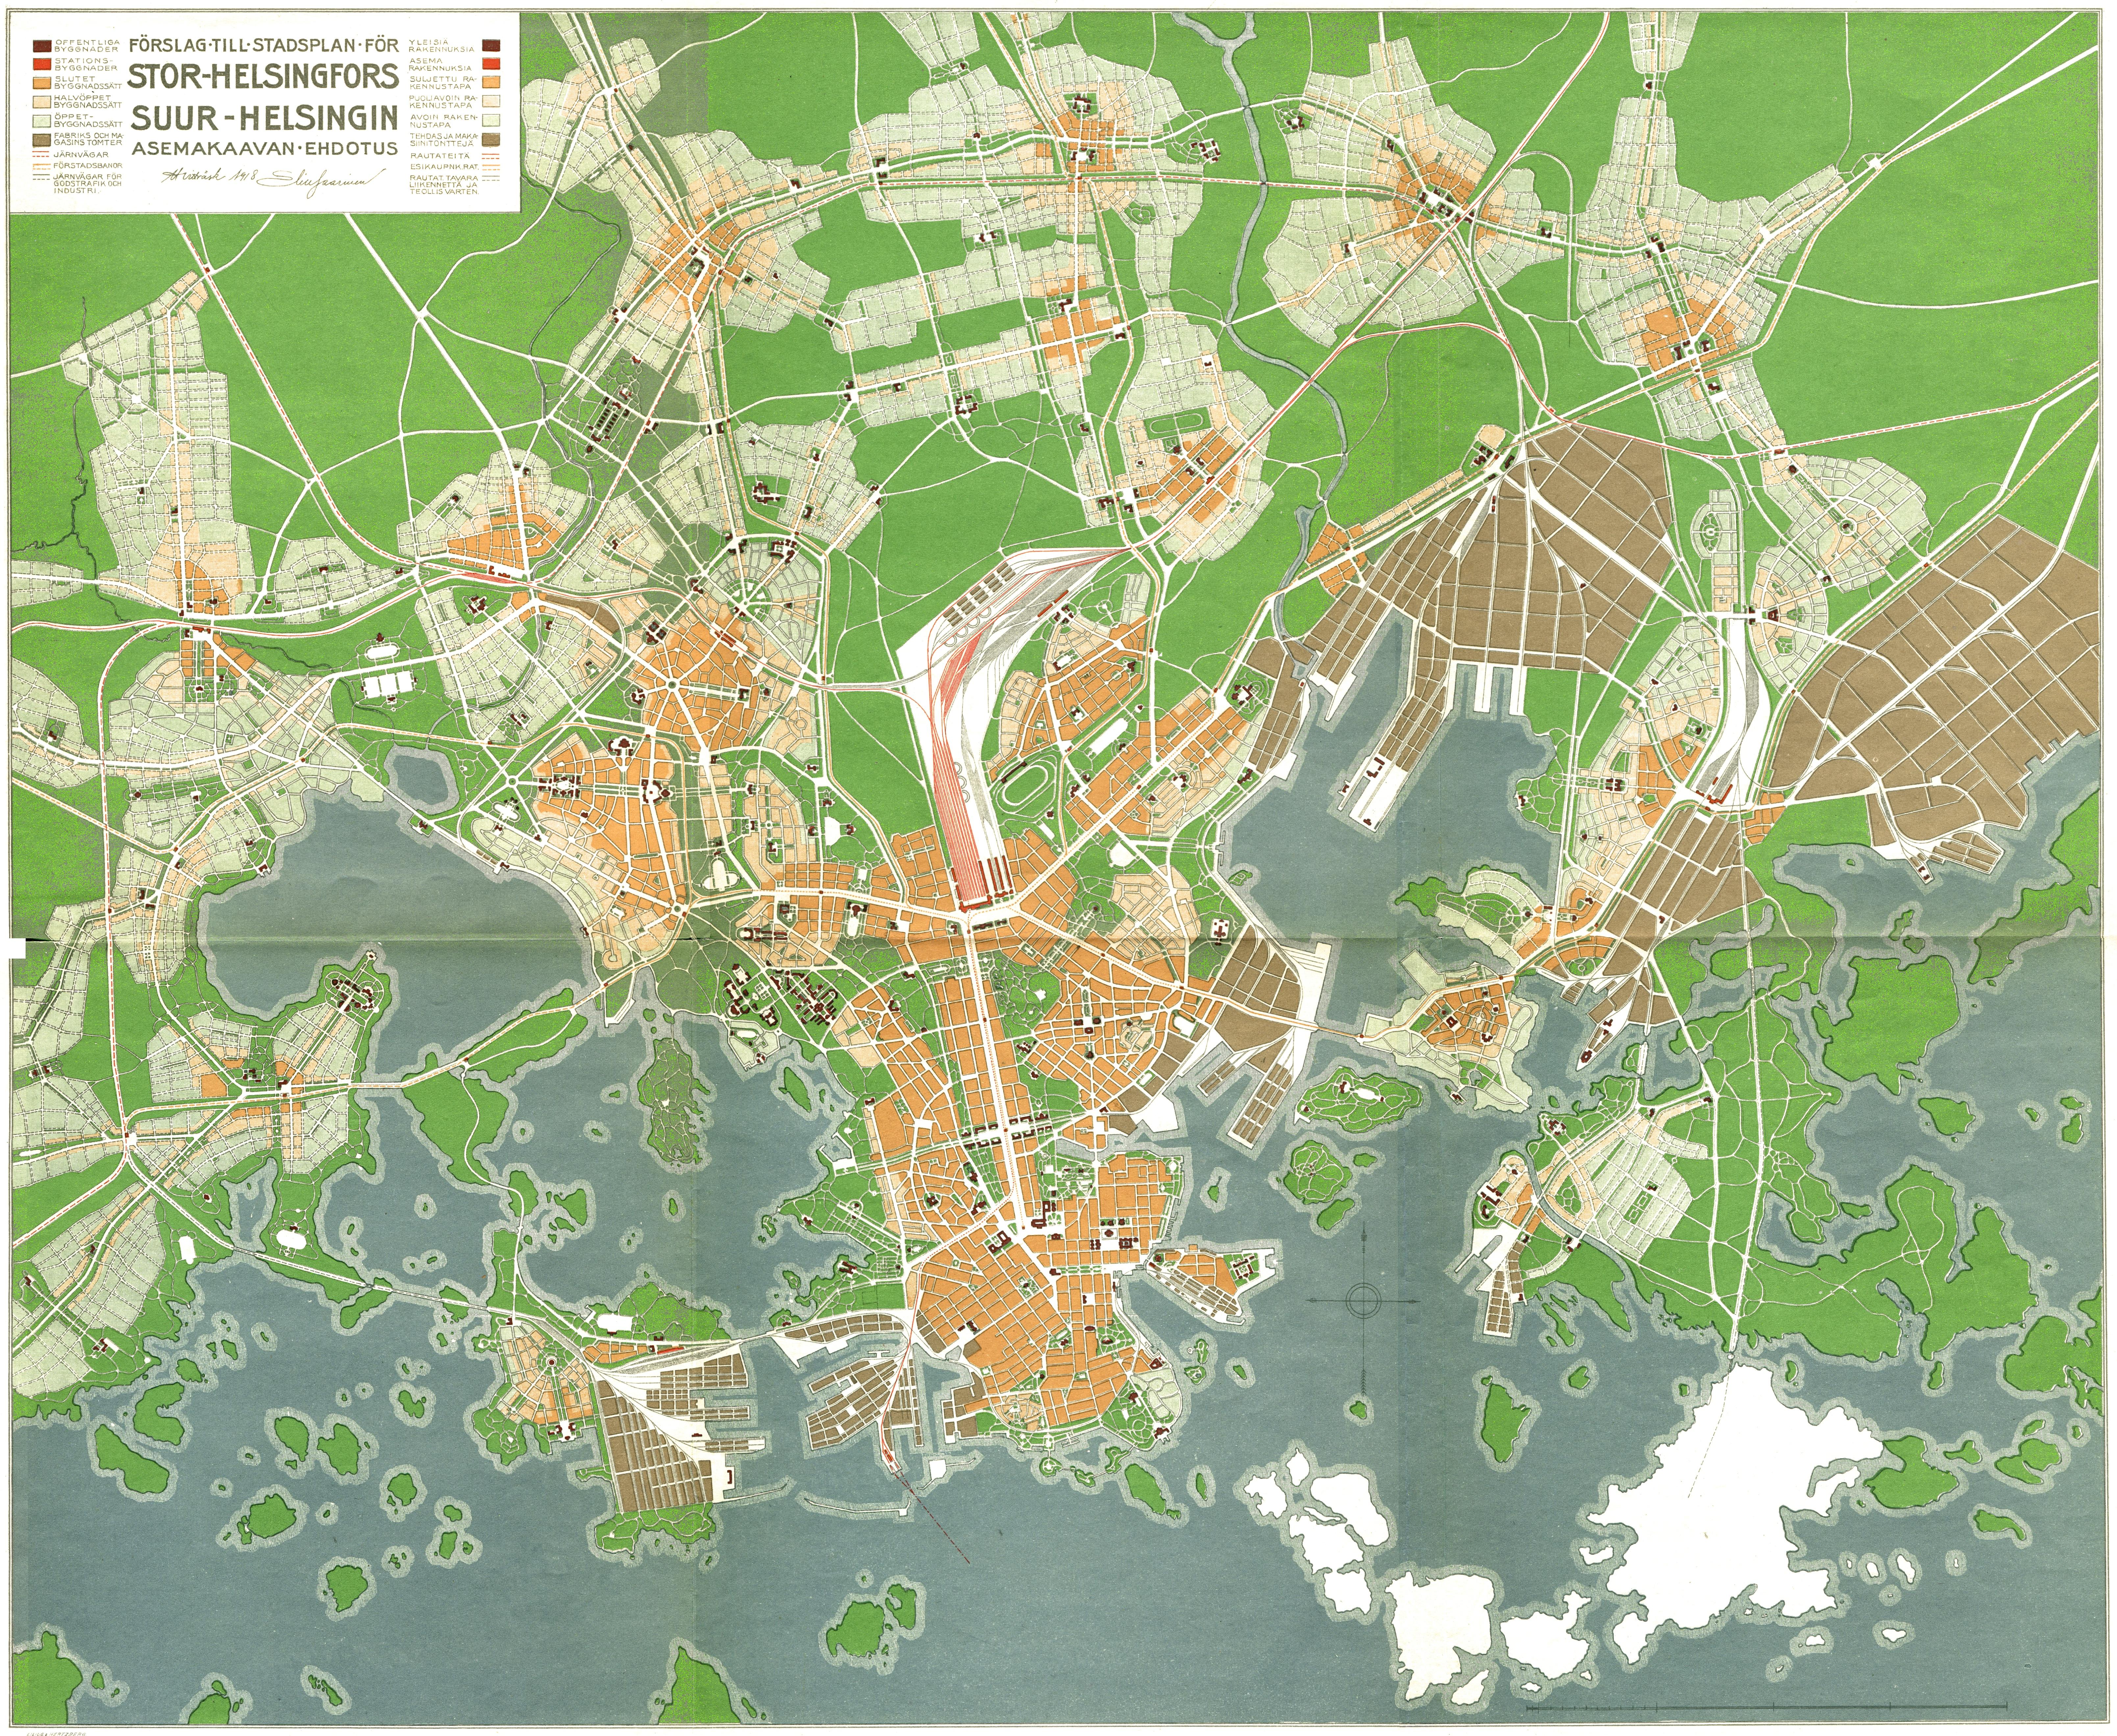 Helsingin kartta 1970